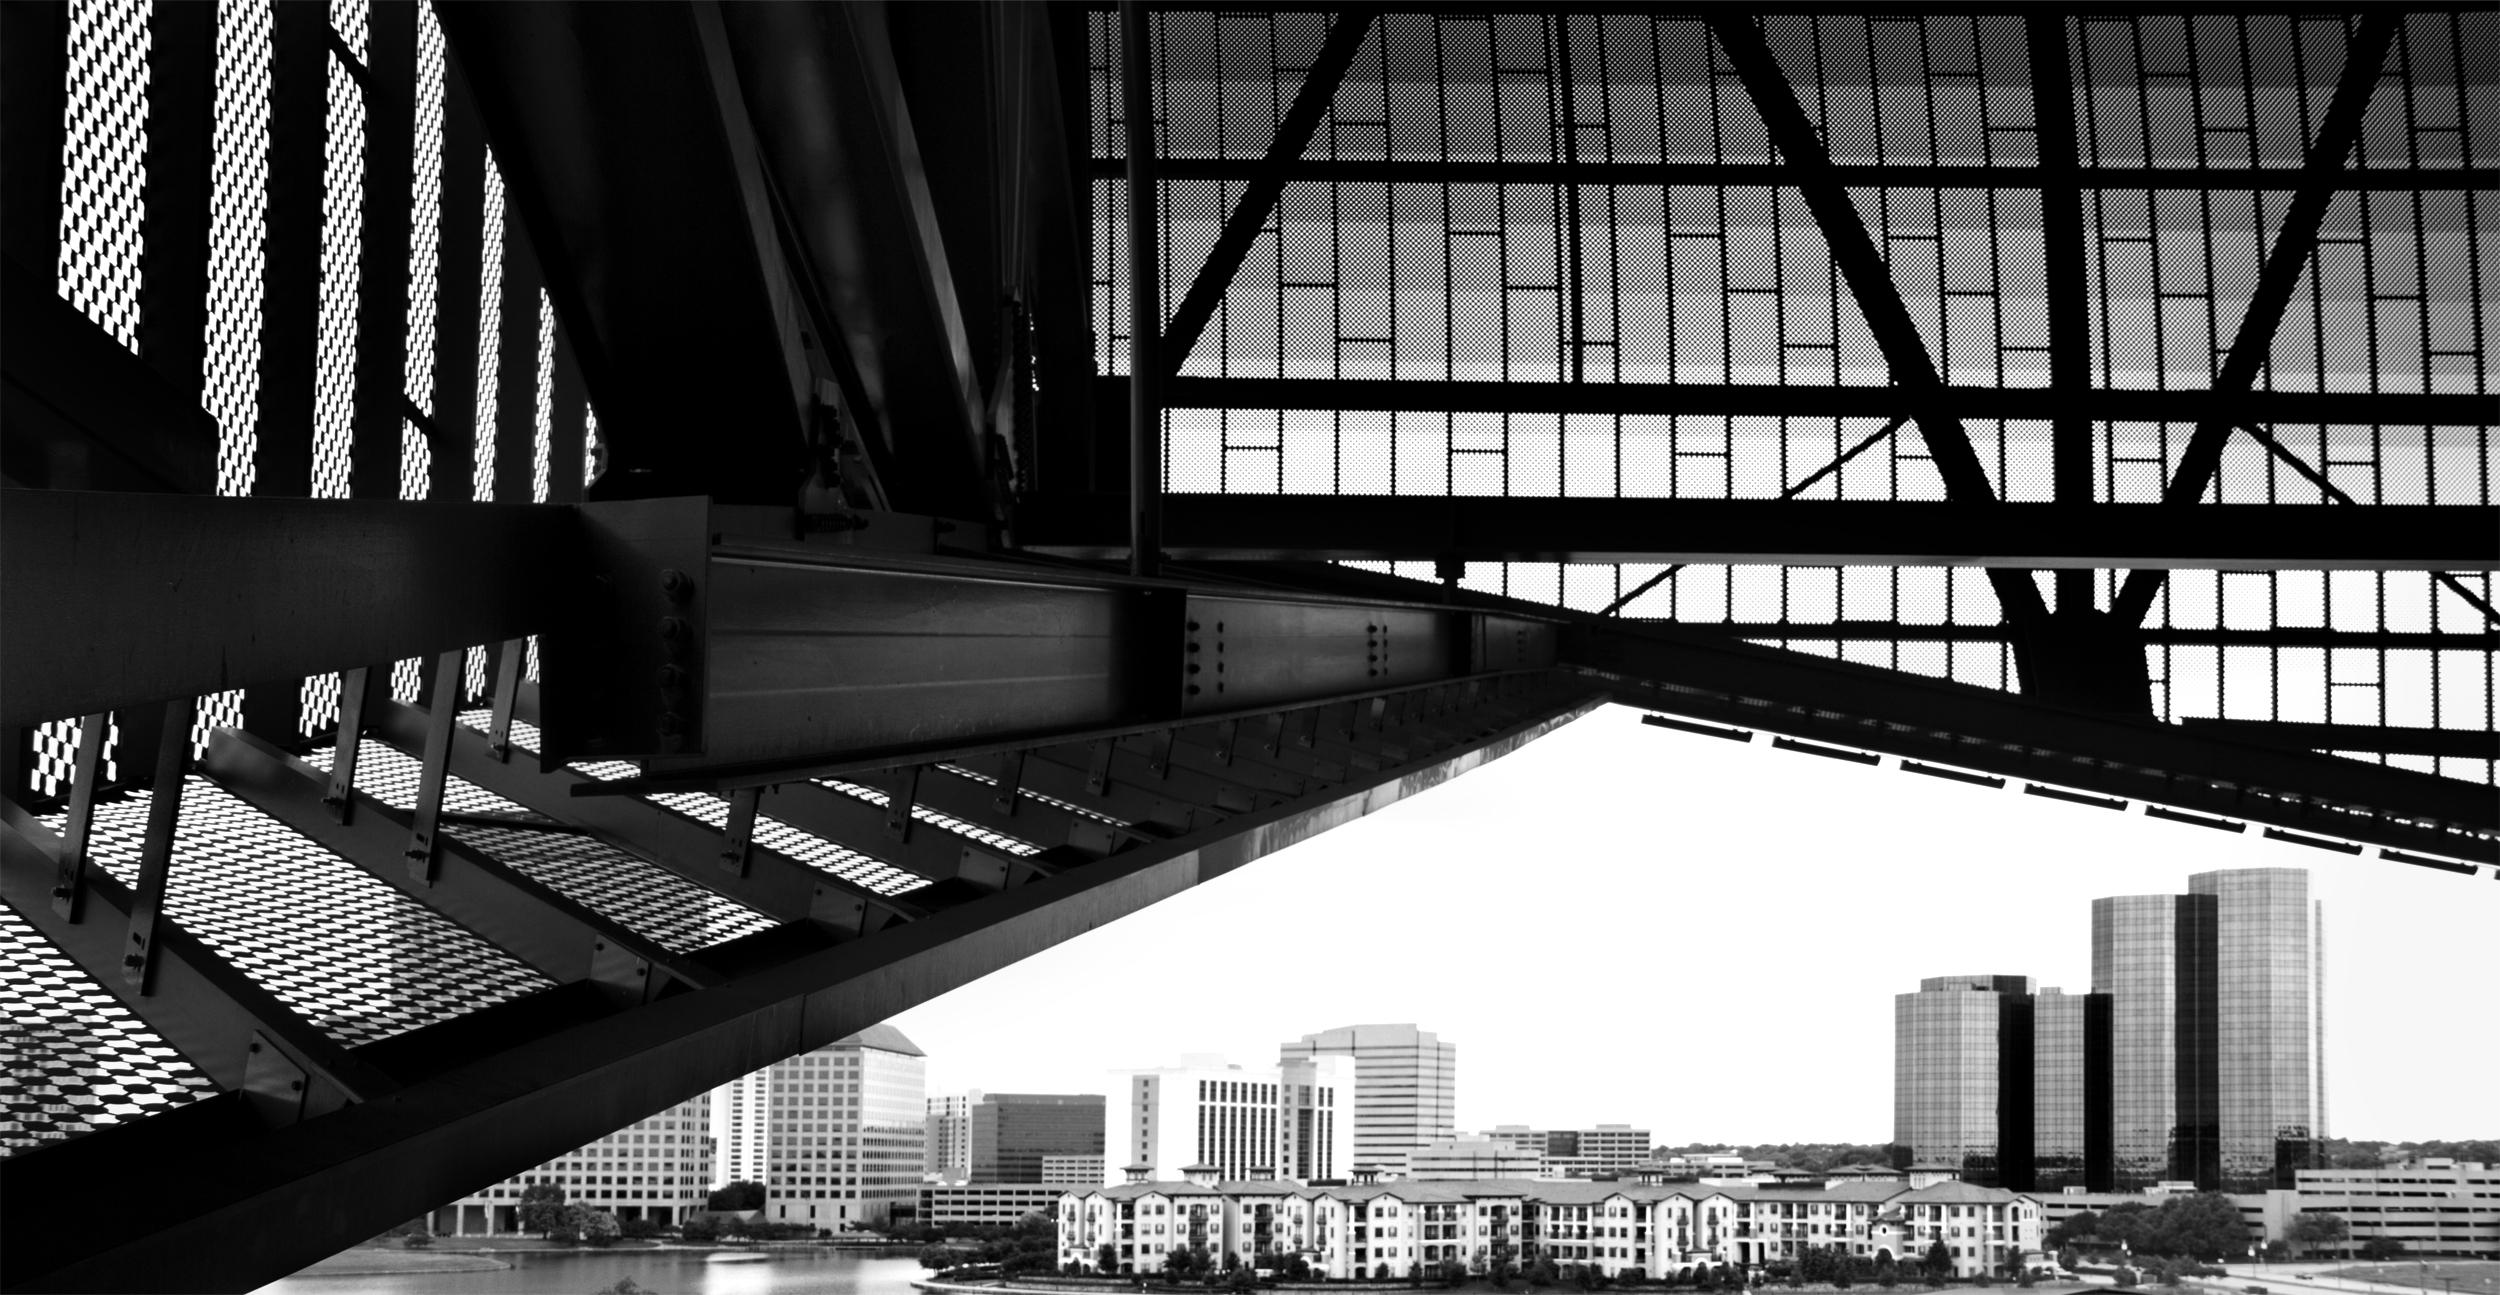 Wolens_AllYears_Architecture_BW_1.jpg